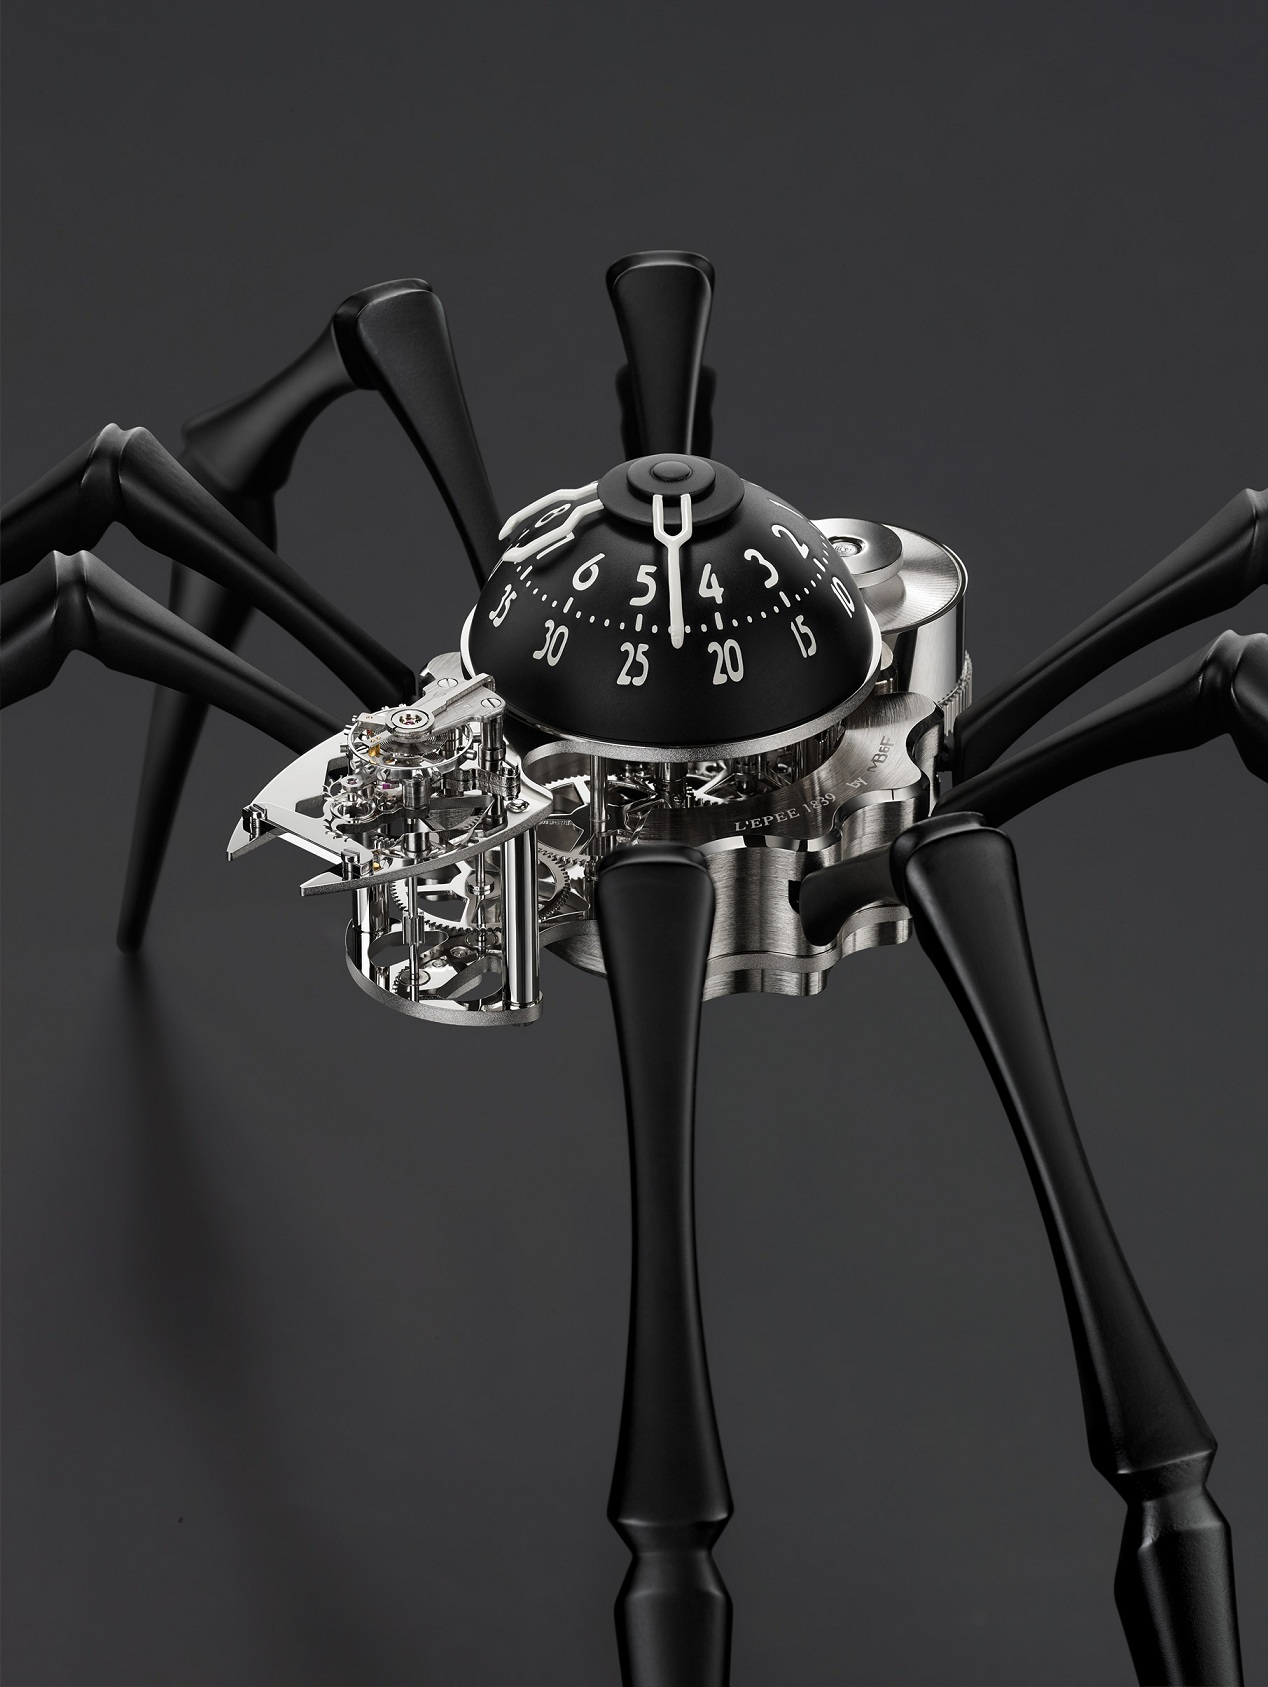 Naziv: Arachnophobia-Black-CloseUp_Lres.jpg, pregleda: 124, veličina: 322,0 KB